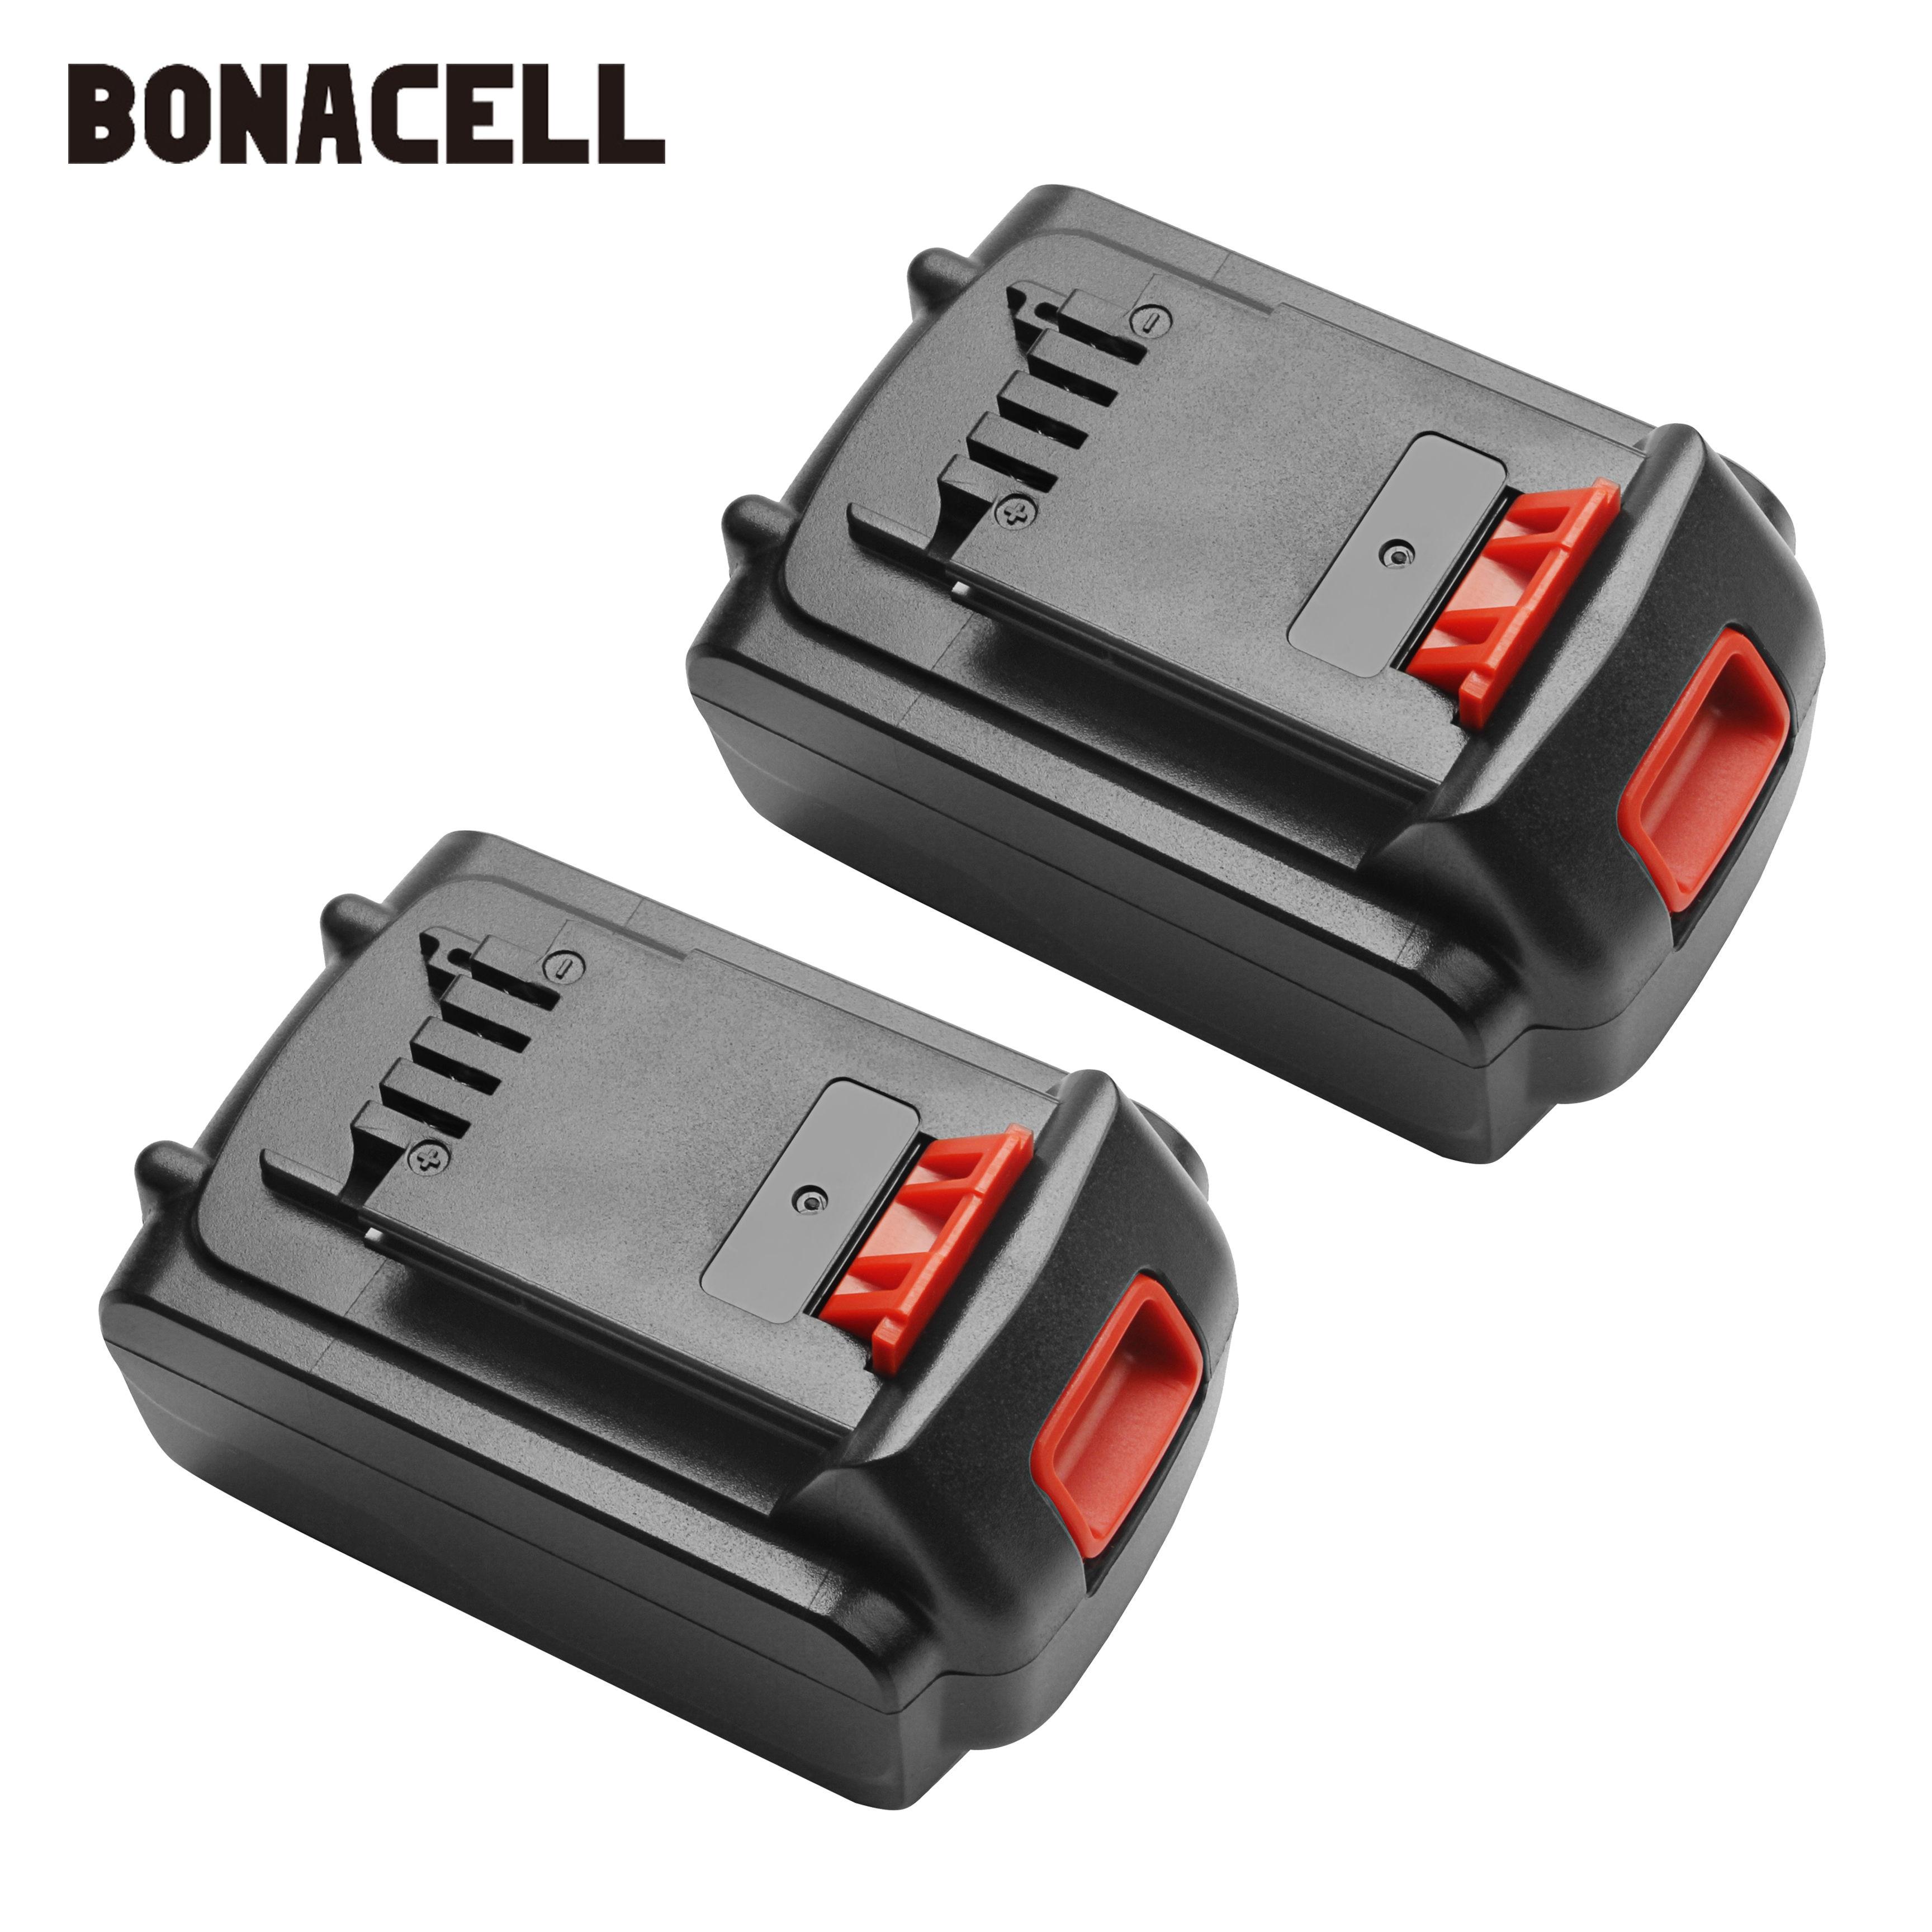 Bonacell 18V/20V 4500mAh Li-ion Rechargeable Battery Power Tool Replacement Battery For BLACK & DECKER LB20 LBX20 LBXR20 L10